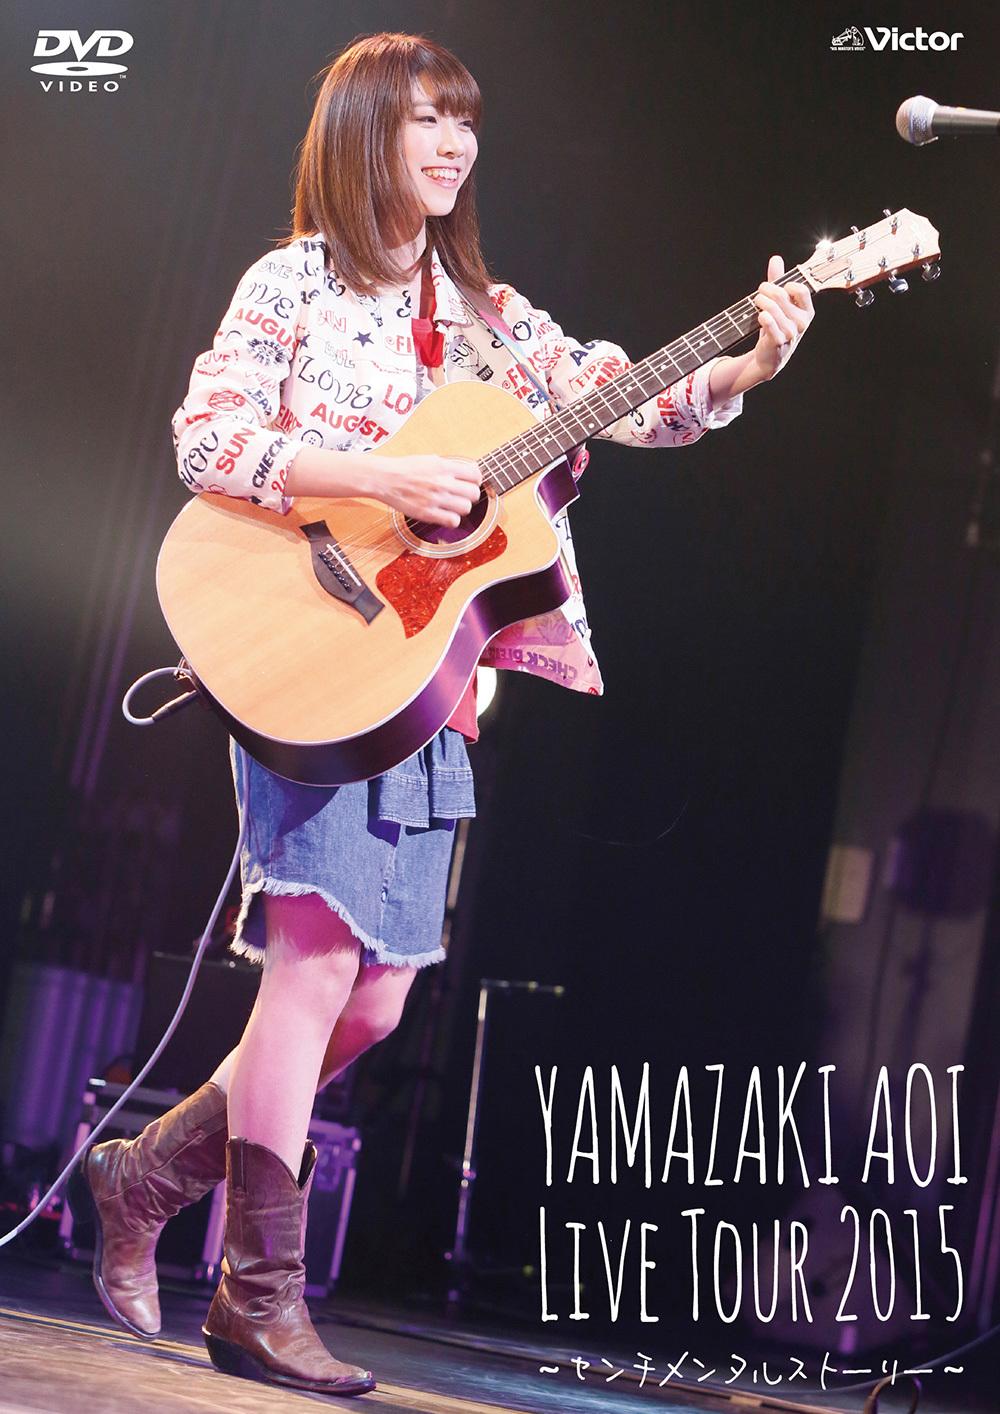 Aoi_livedvd2015_jk